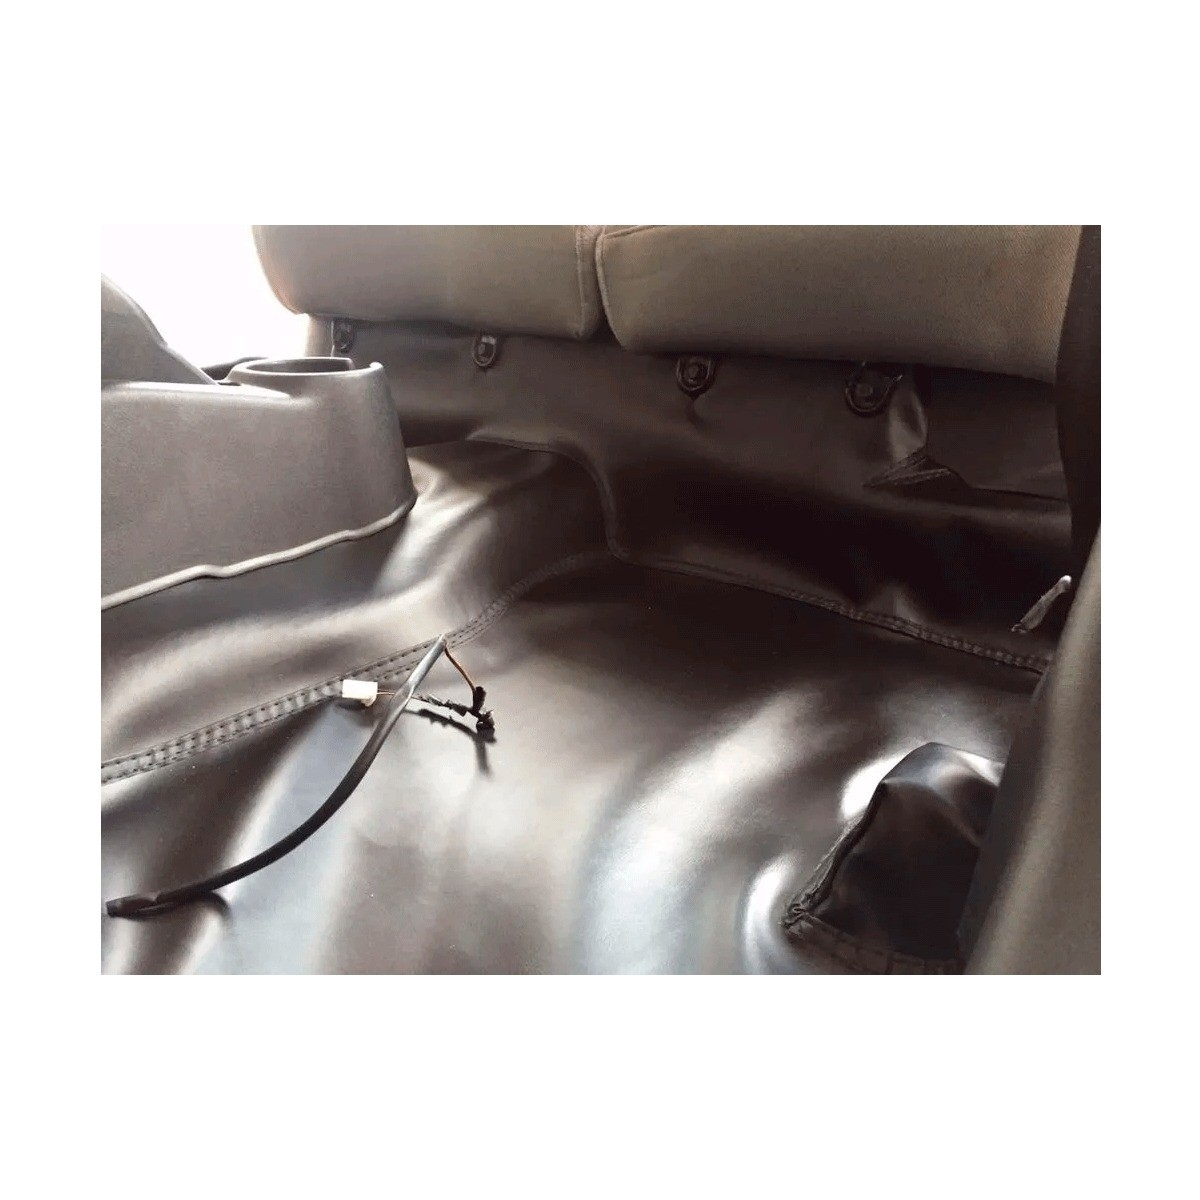 Tapete Automotivo Assoalho Emborrachado Bidim Volkswagen Saveiro Bola